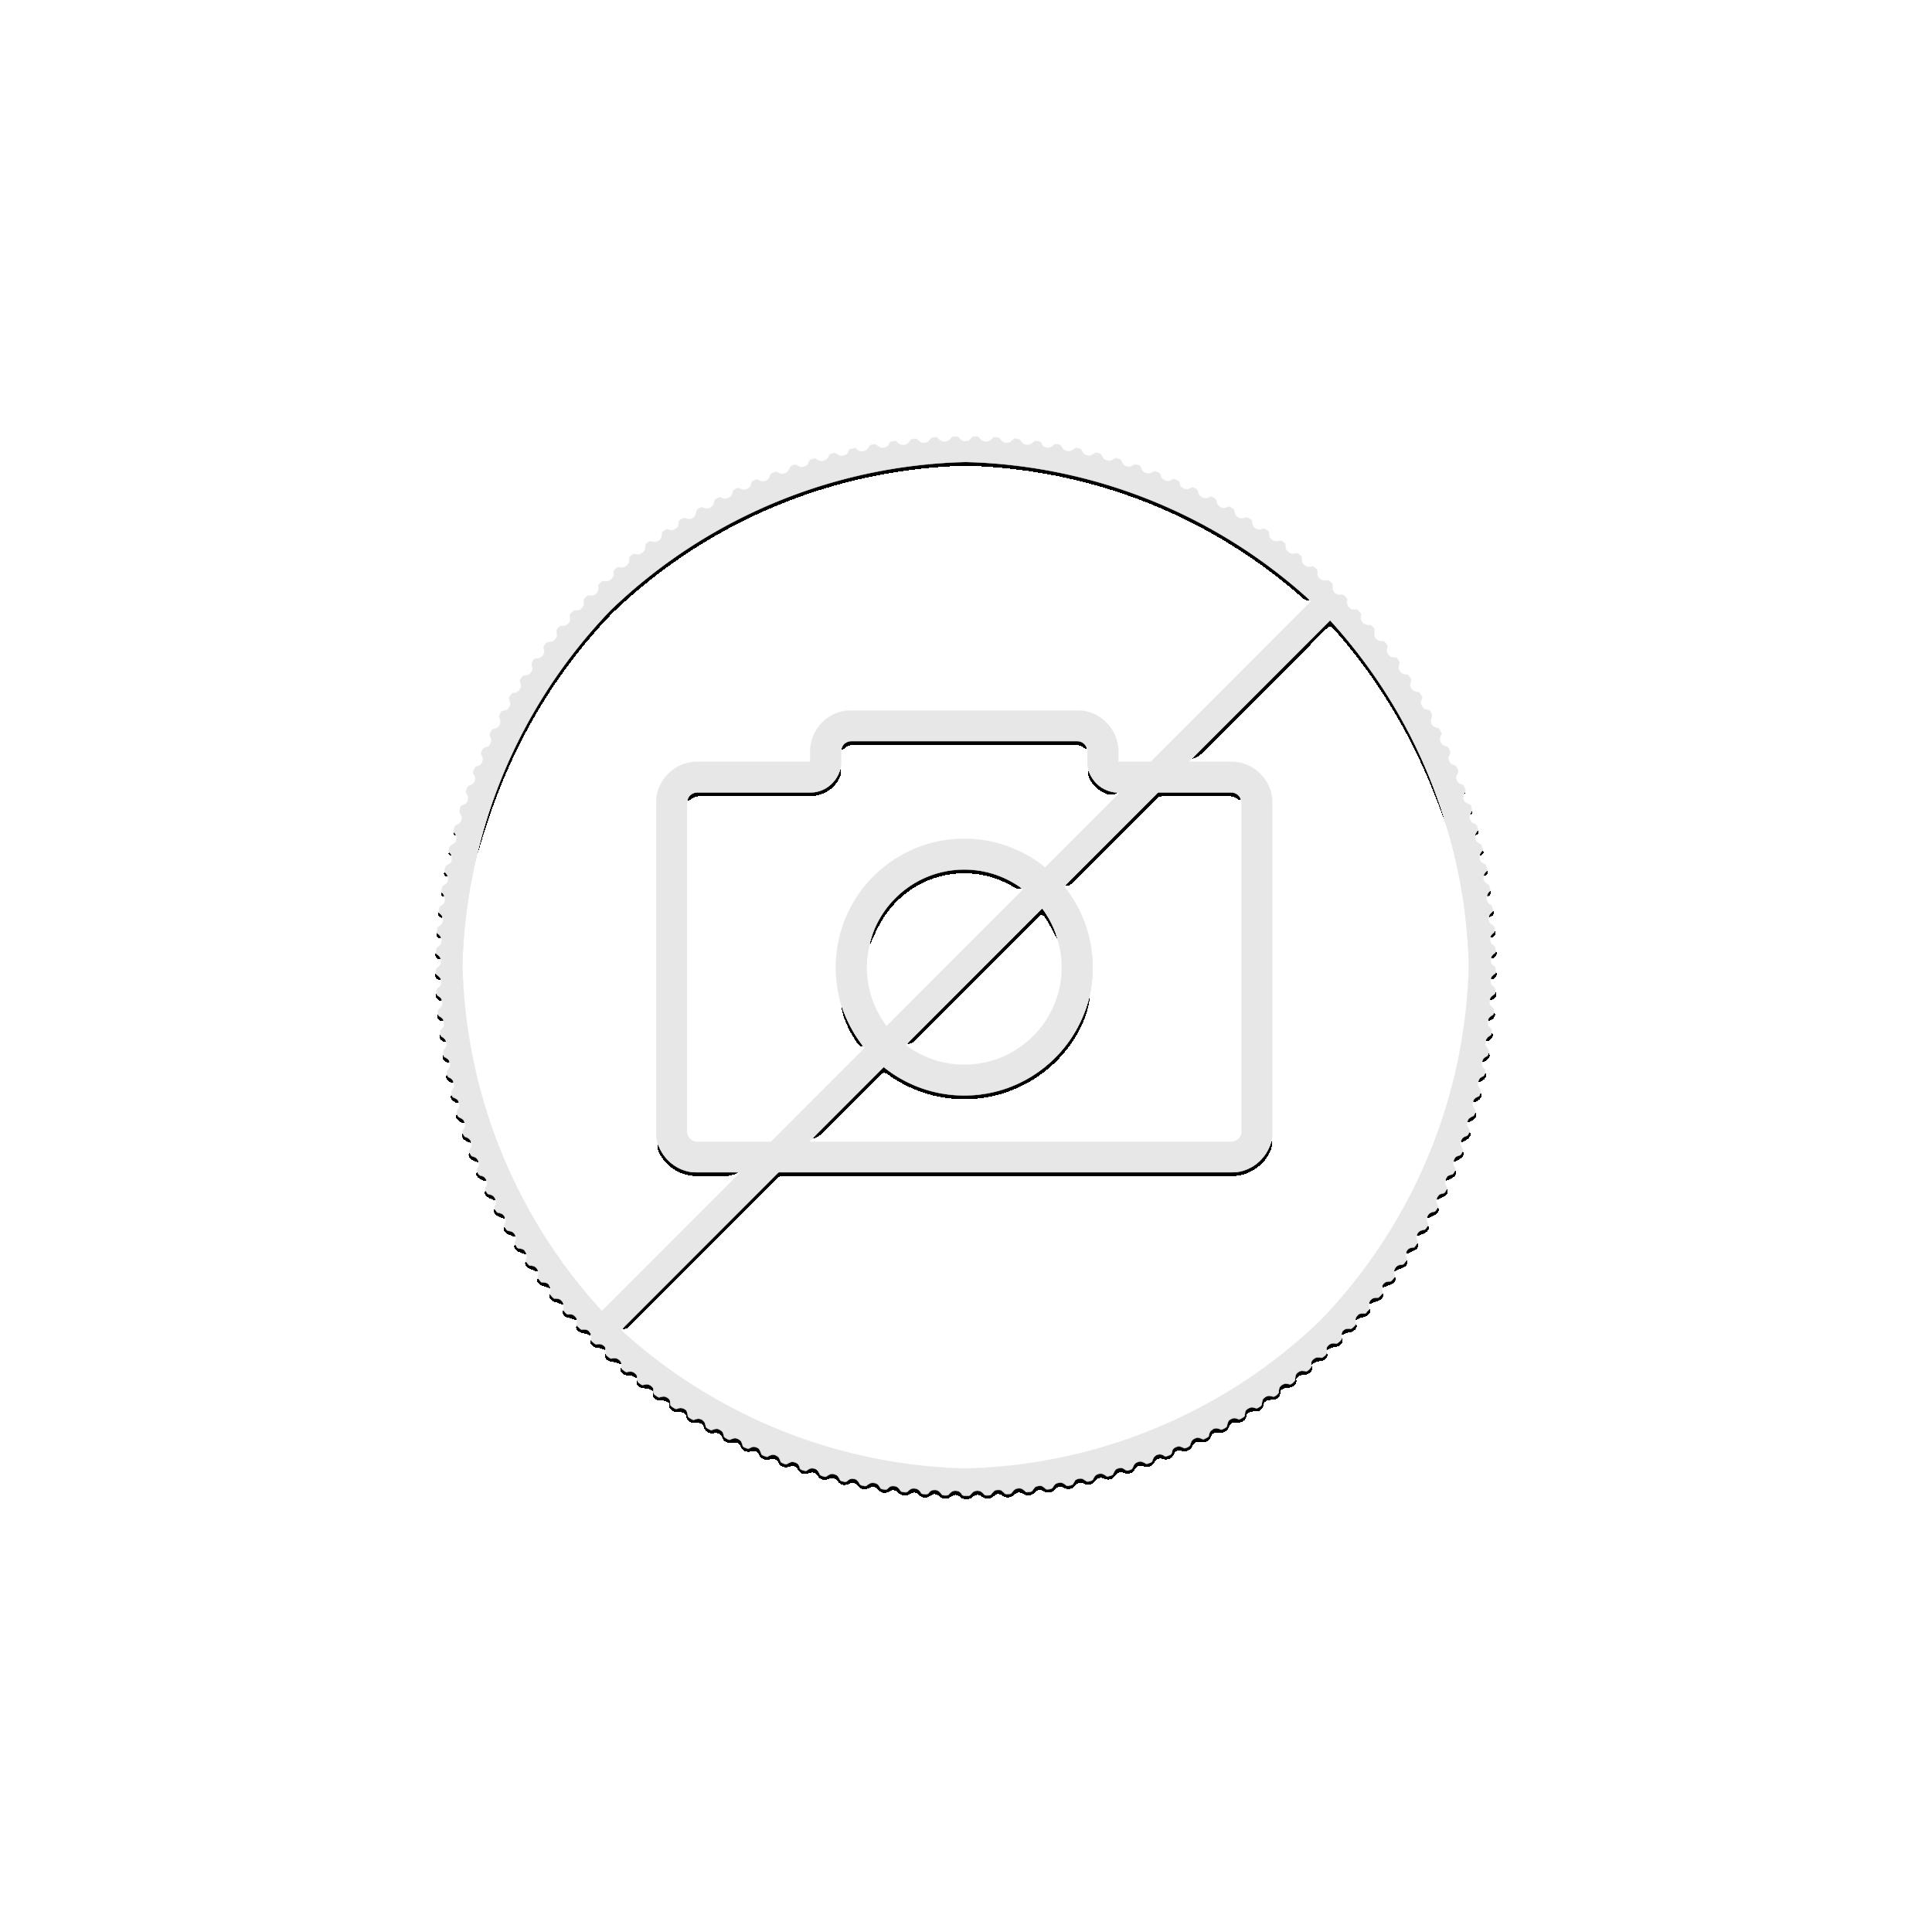 1/2 troy ounce silver coin Lunar 2021 Proof